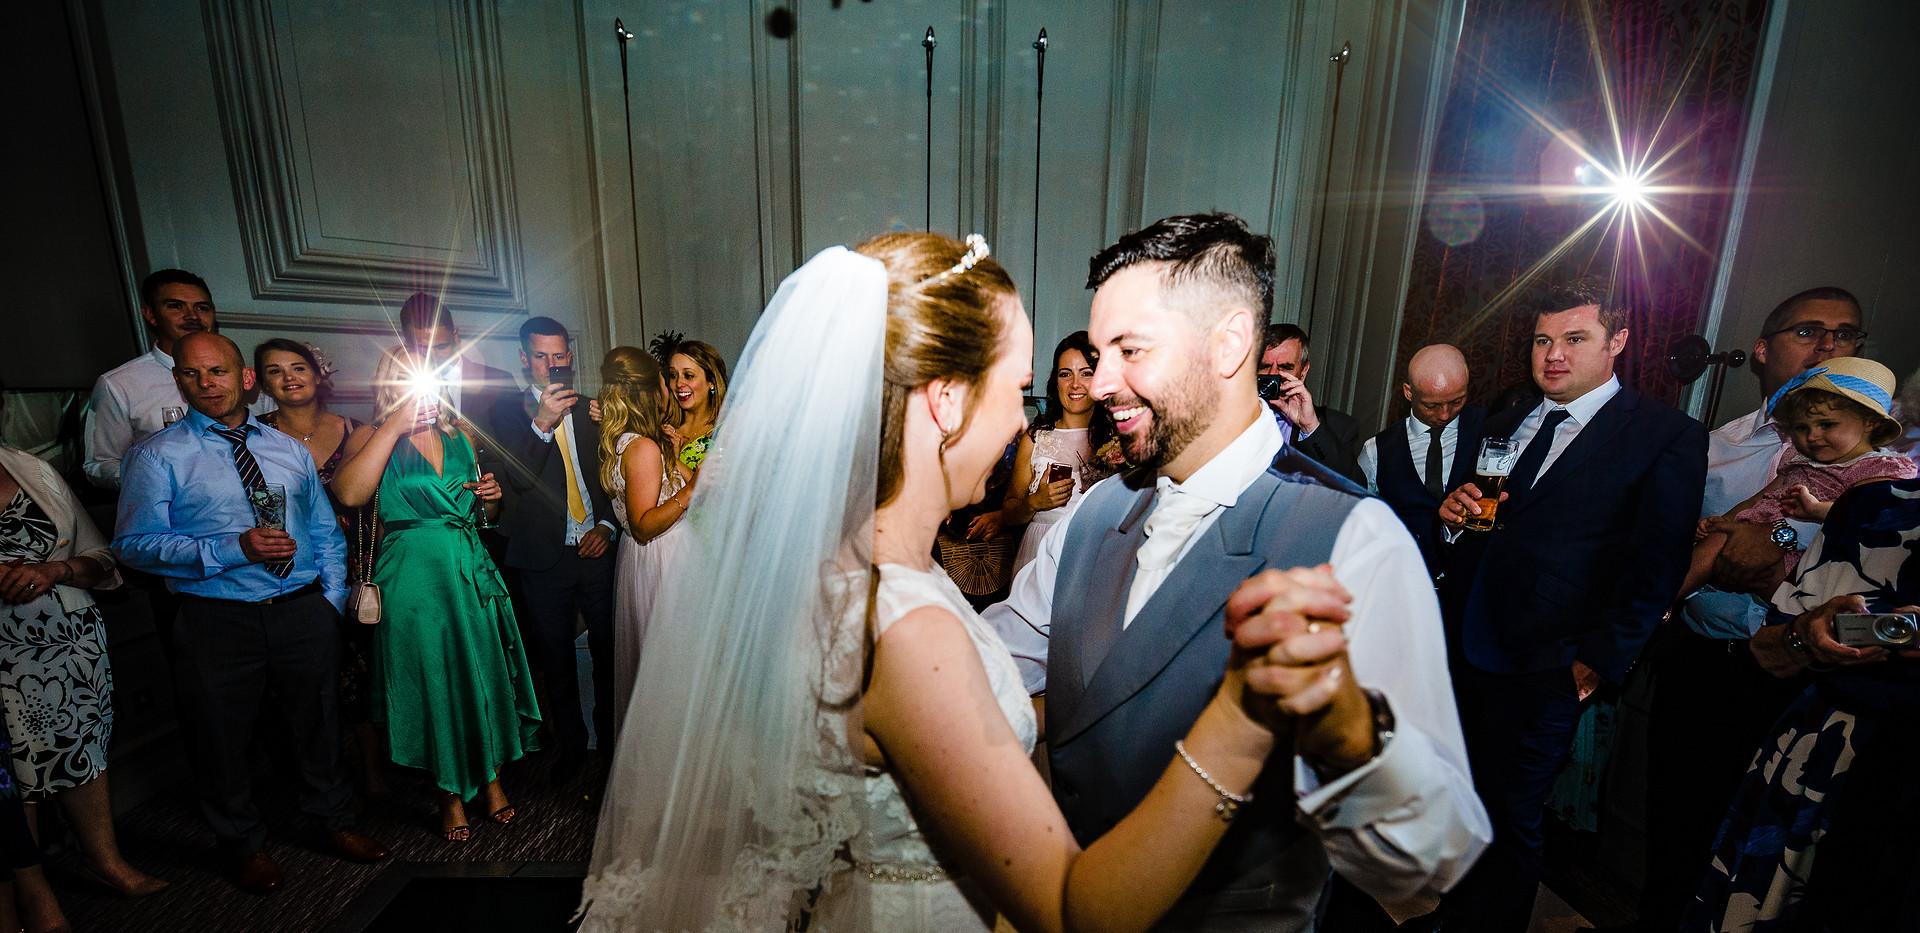 Oddfellows Wedding Photography___40.jpg